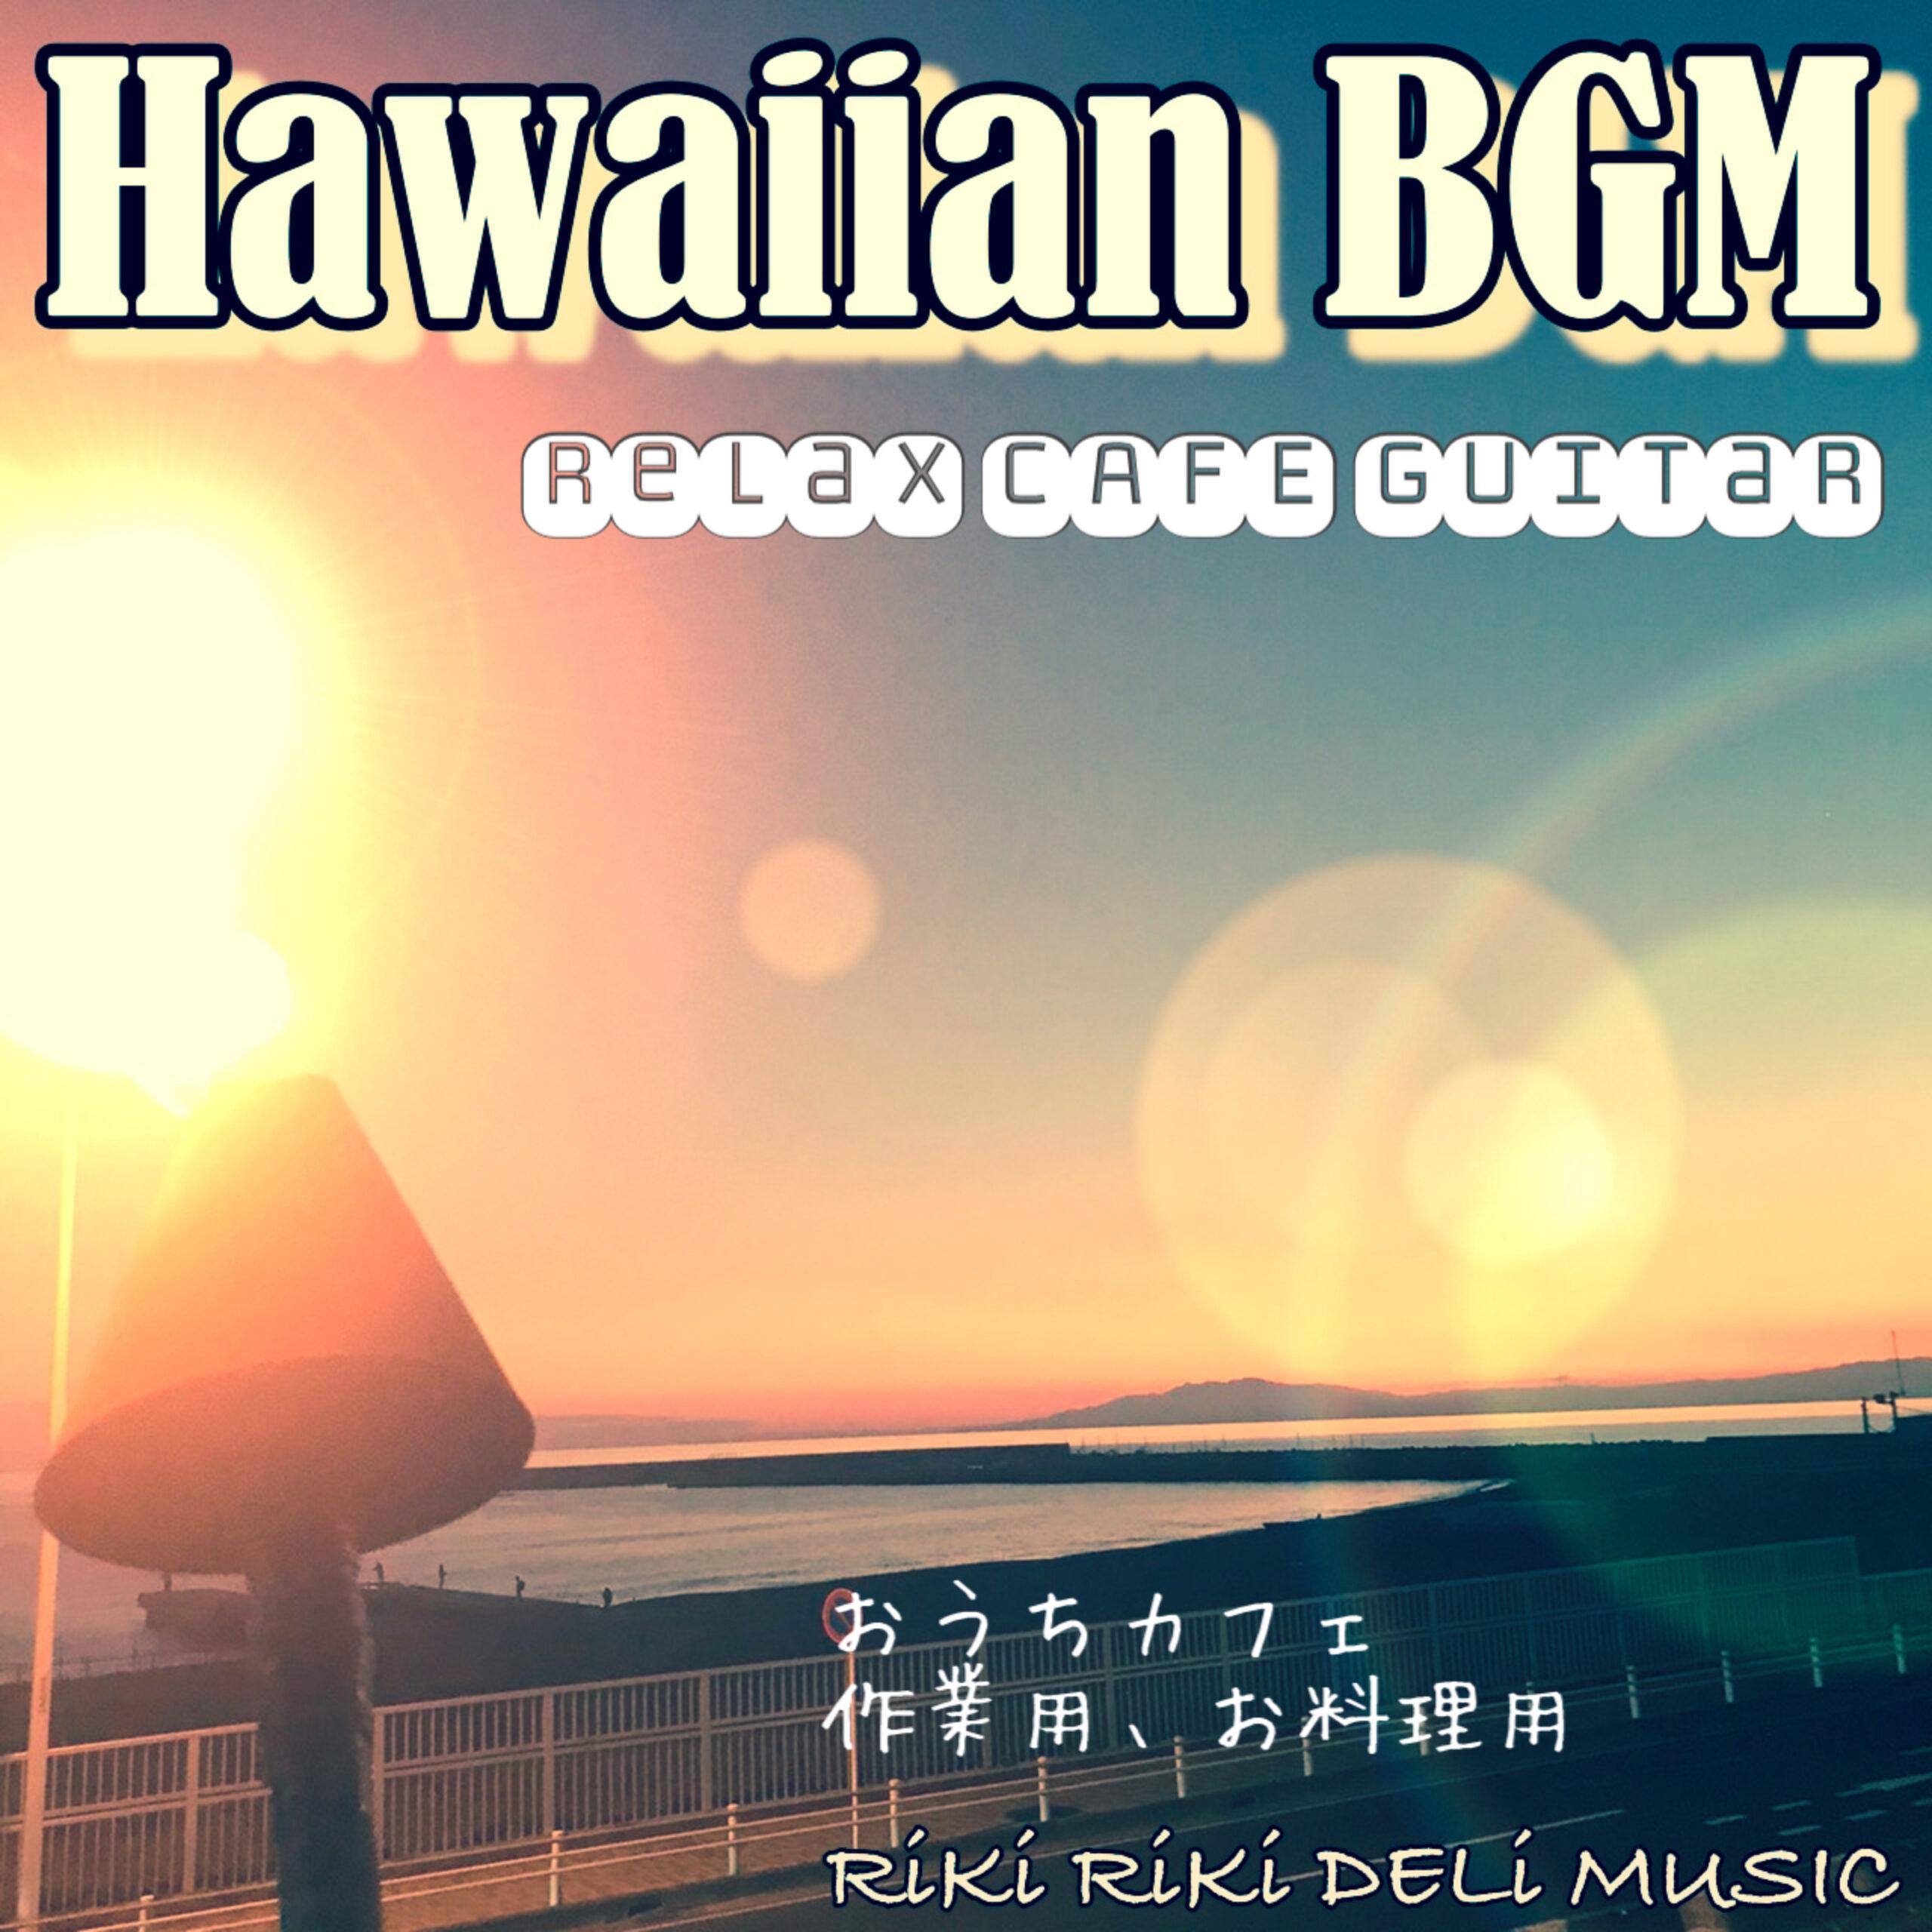 Hawaiian BGM Relax CAFE Guitar おうちカフェ、作業用、お料理用 RiKiRiKiDELi MUSIC